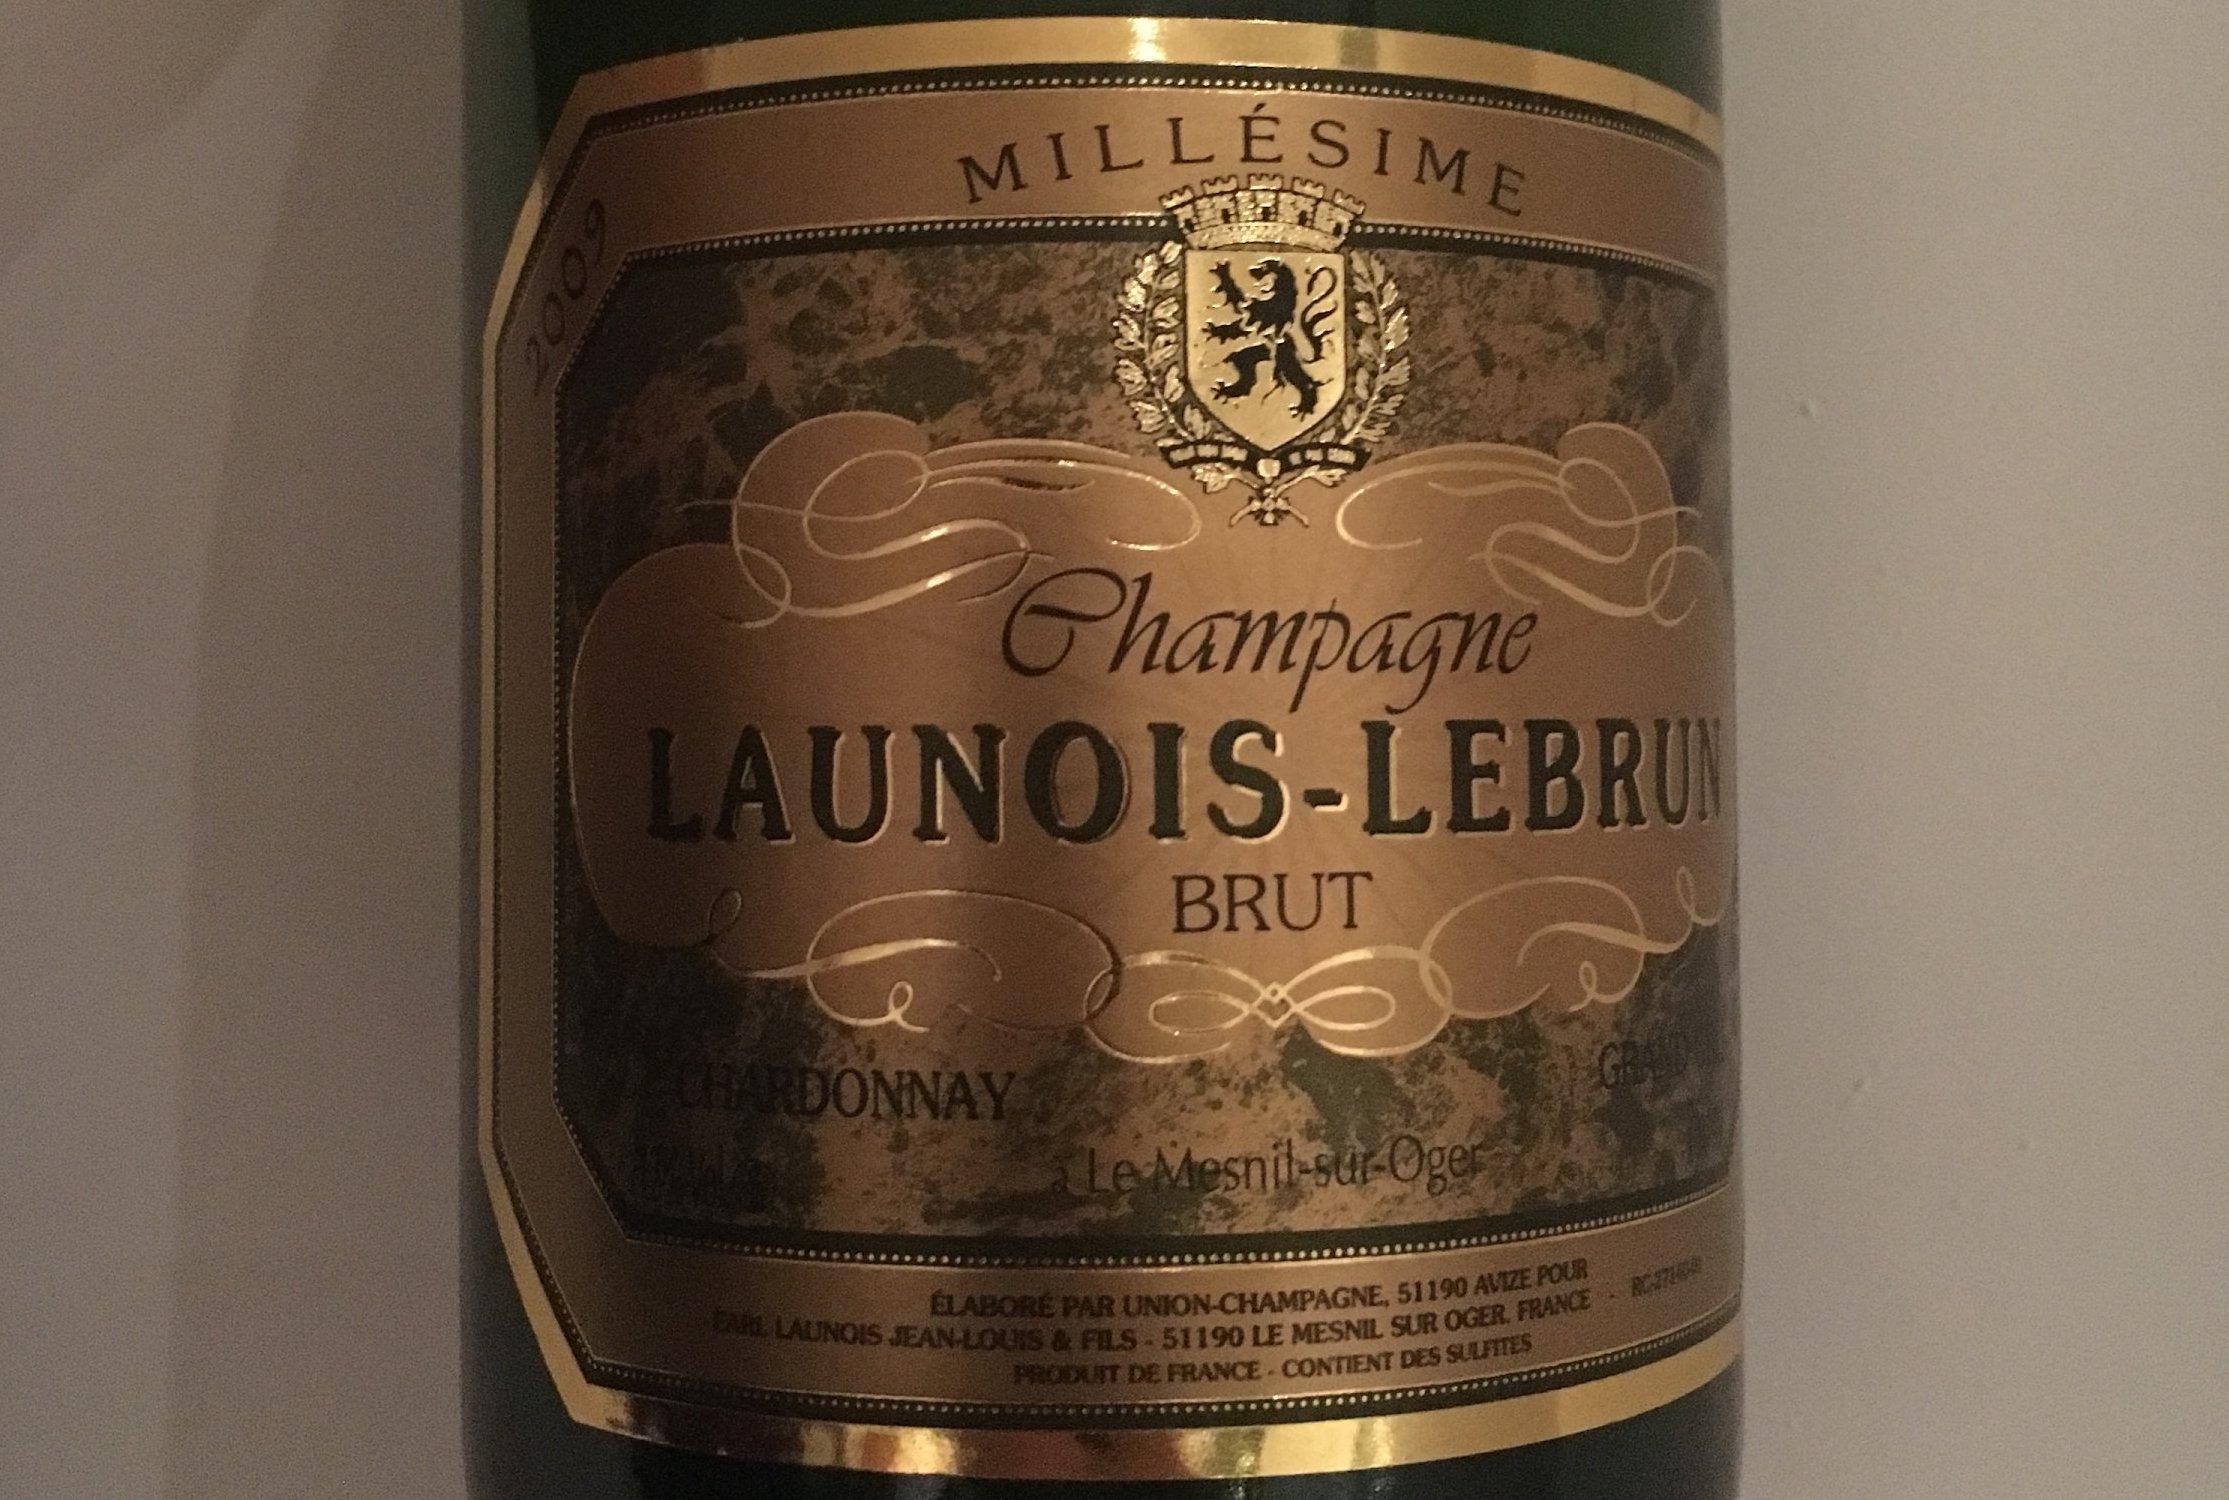 Champagne Launois Lebrun Millesime